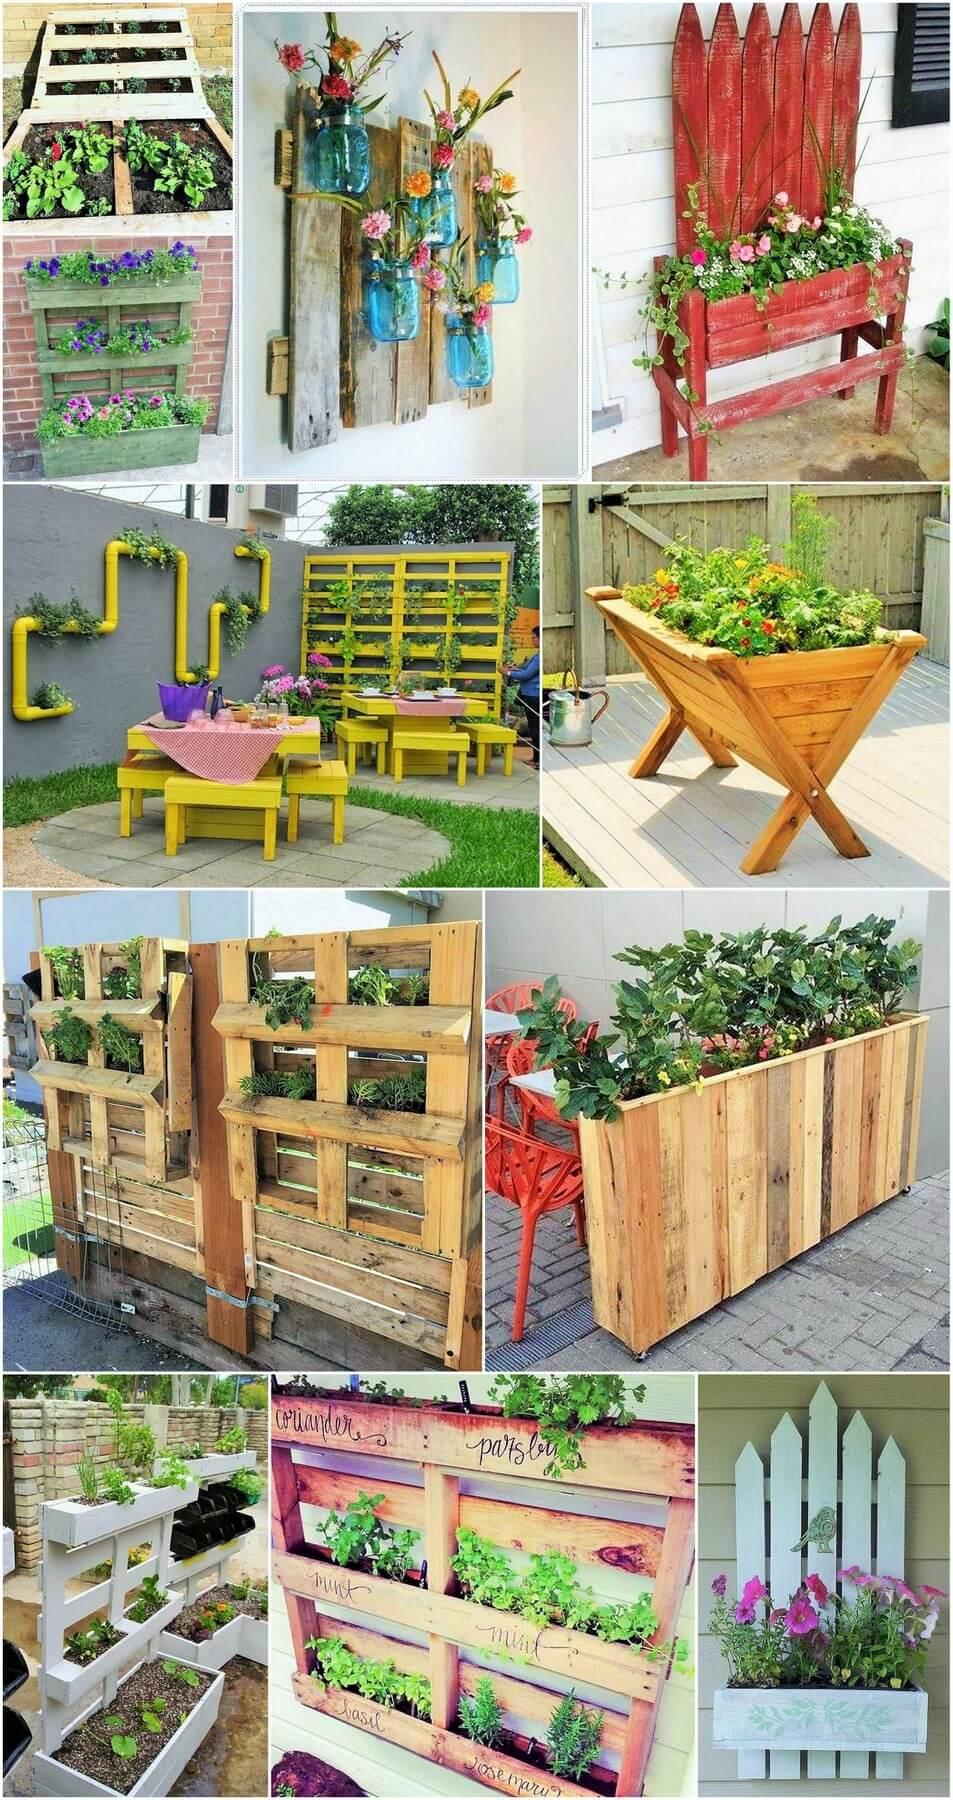 Homemade DIY Wooden Pallet Small Planter Ideas